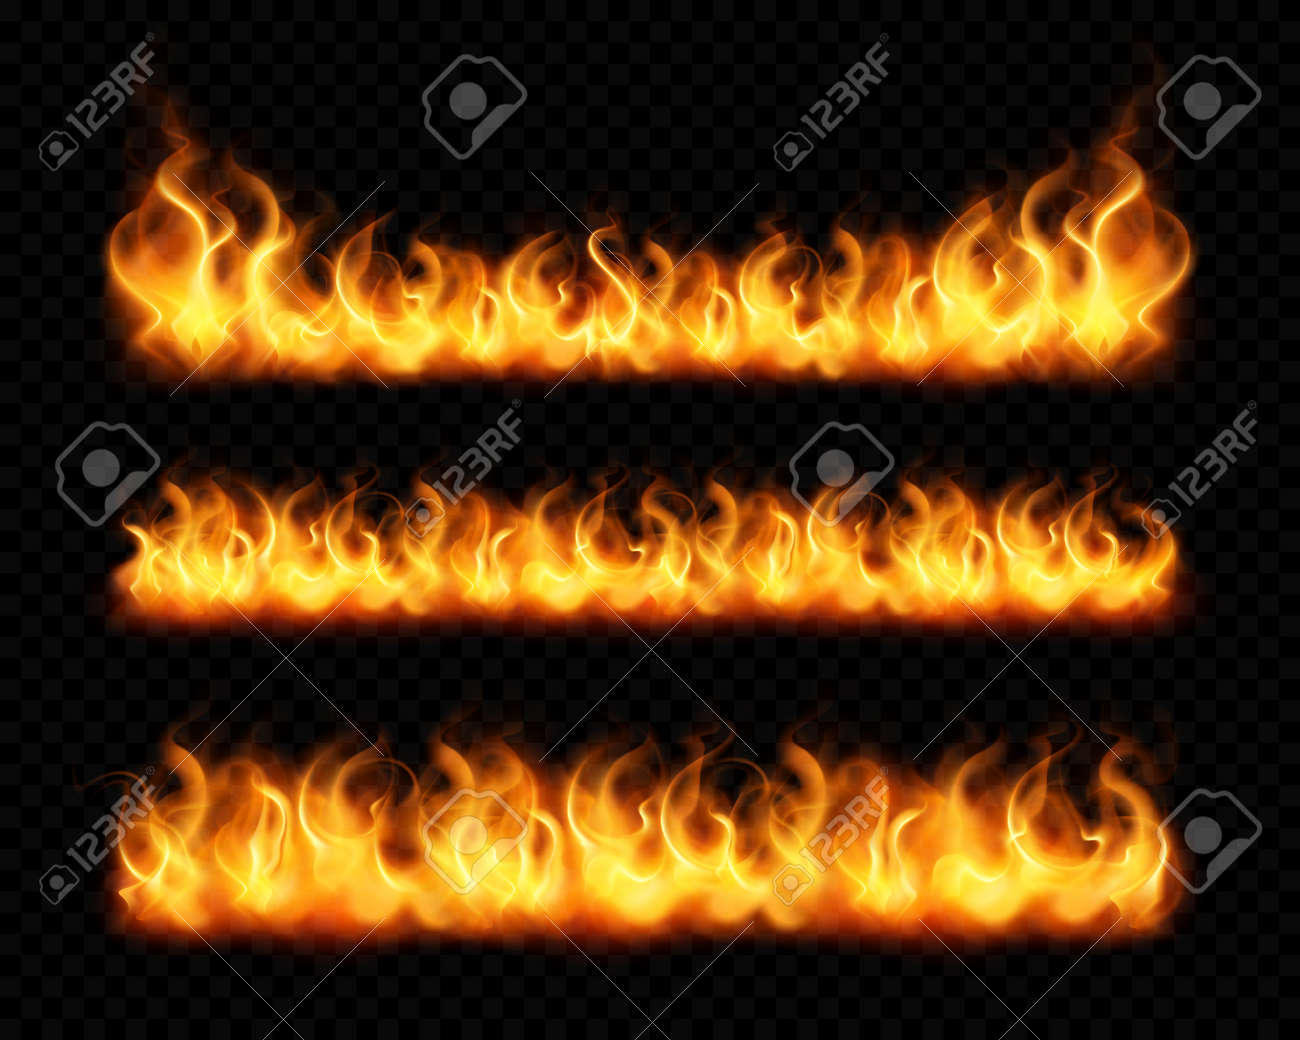 Fire flame realistic borders set of horizontal burning bonfires isolated on dark transparent background vector illustration - 166354222